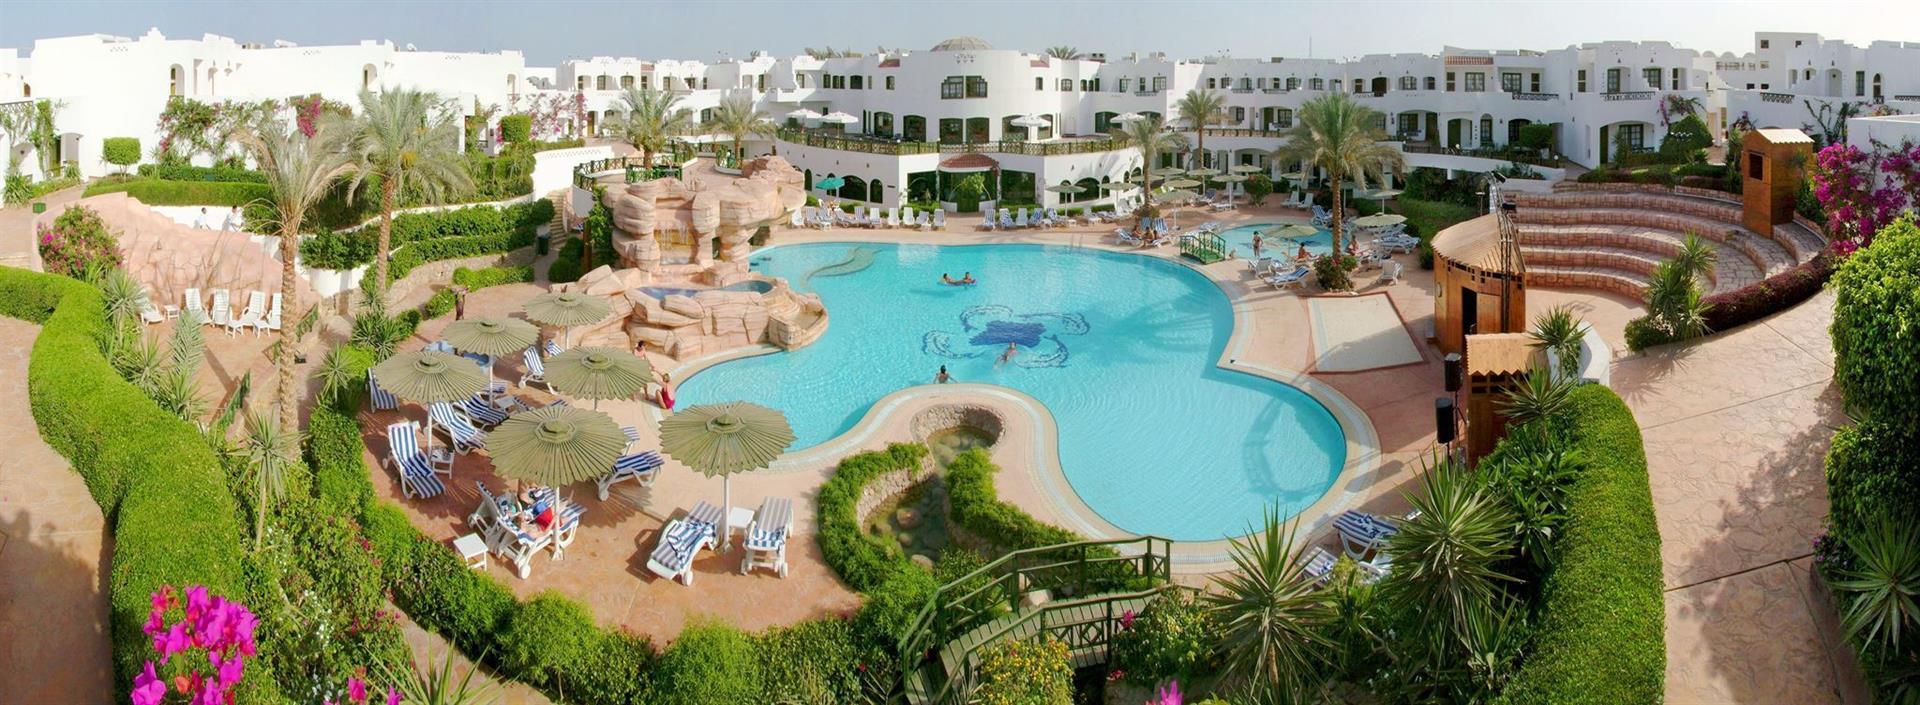 Verginia Sharm Resort & Aqua Park 5*